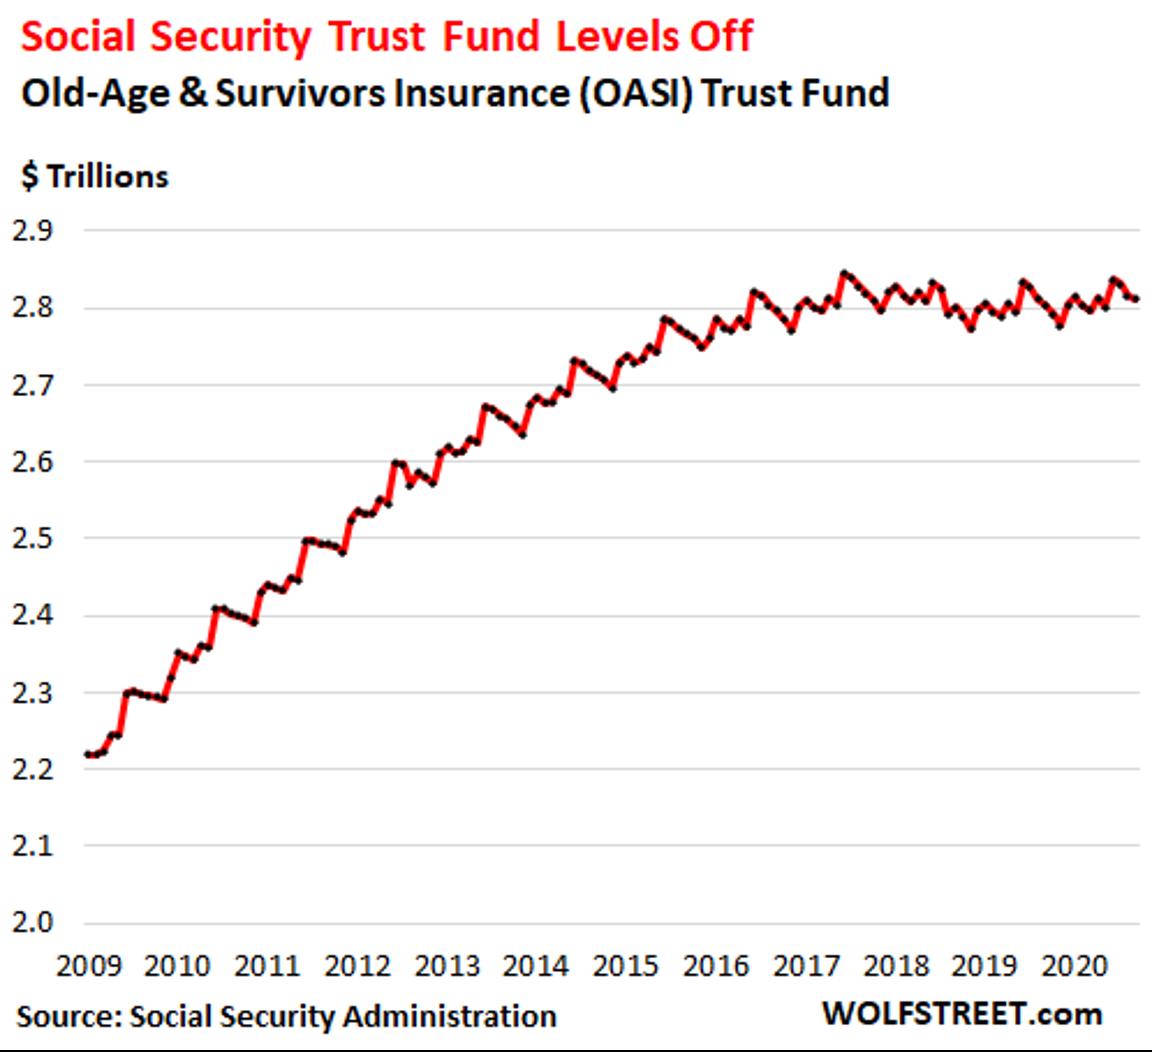 Social Security Trust Fun Levels Off